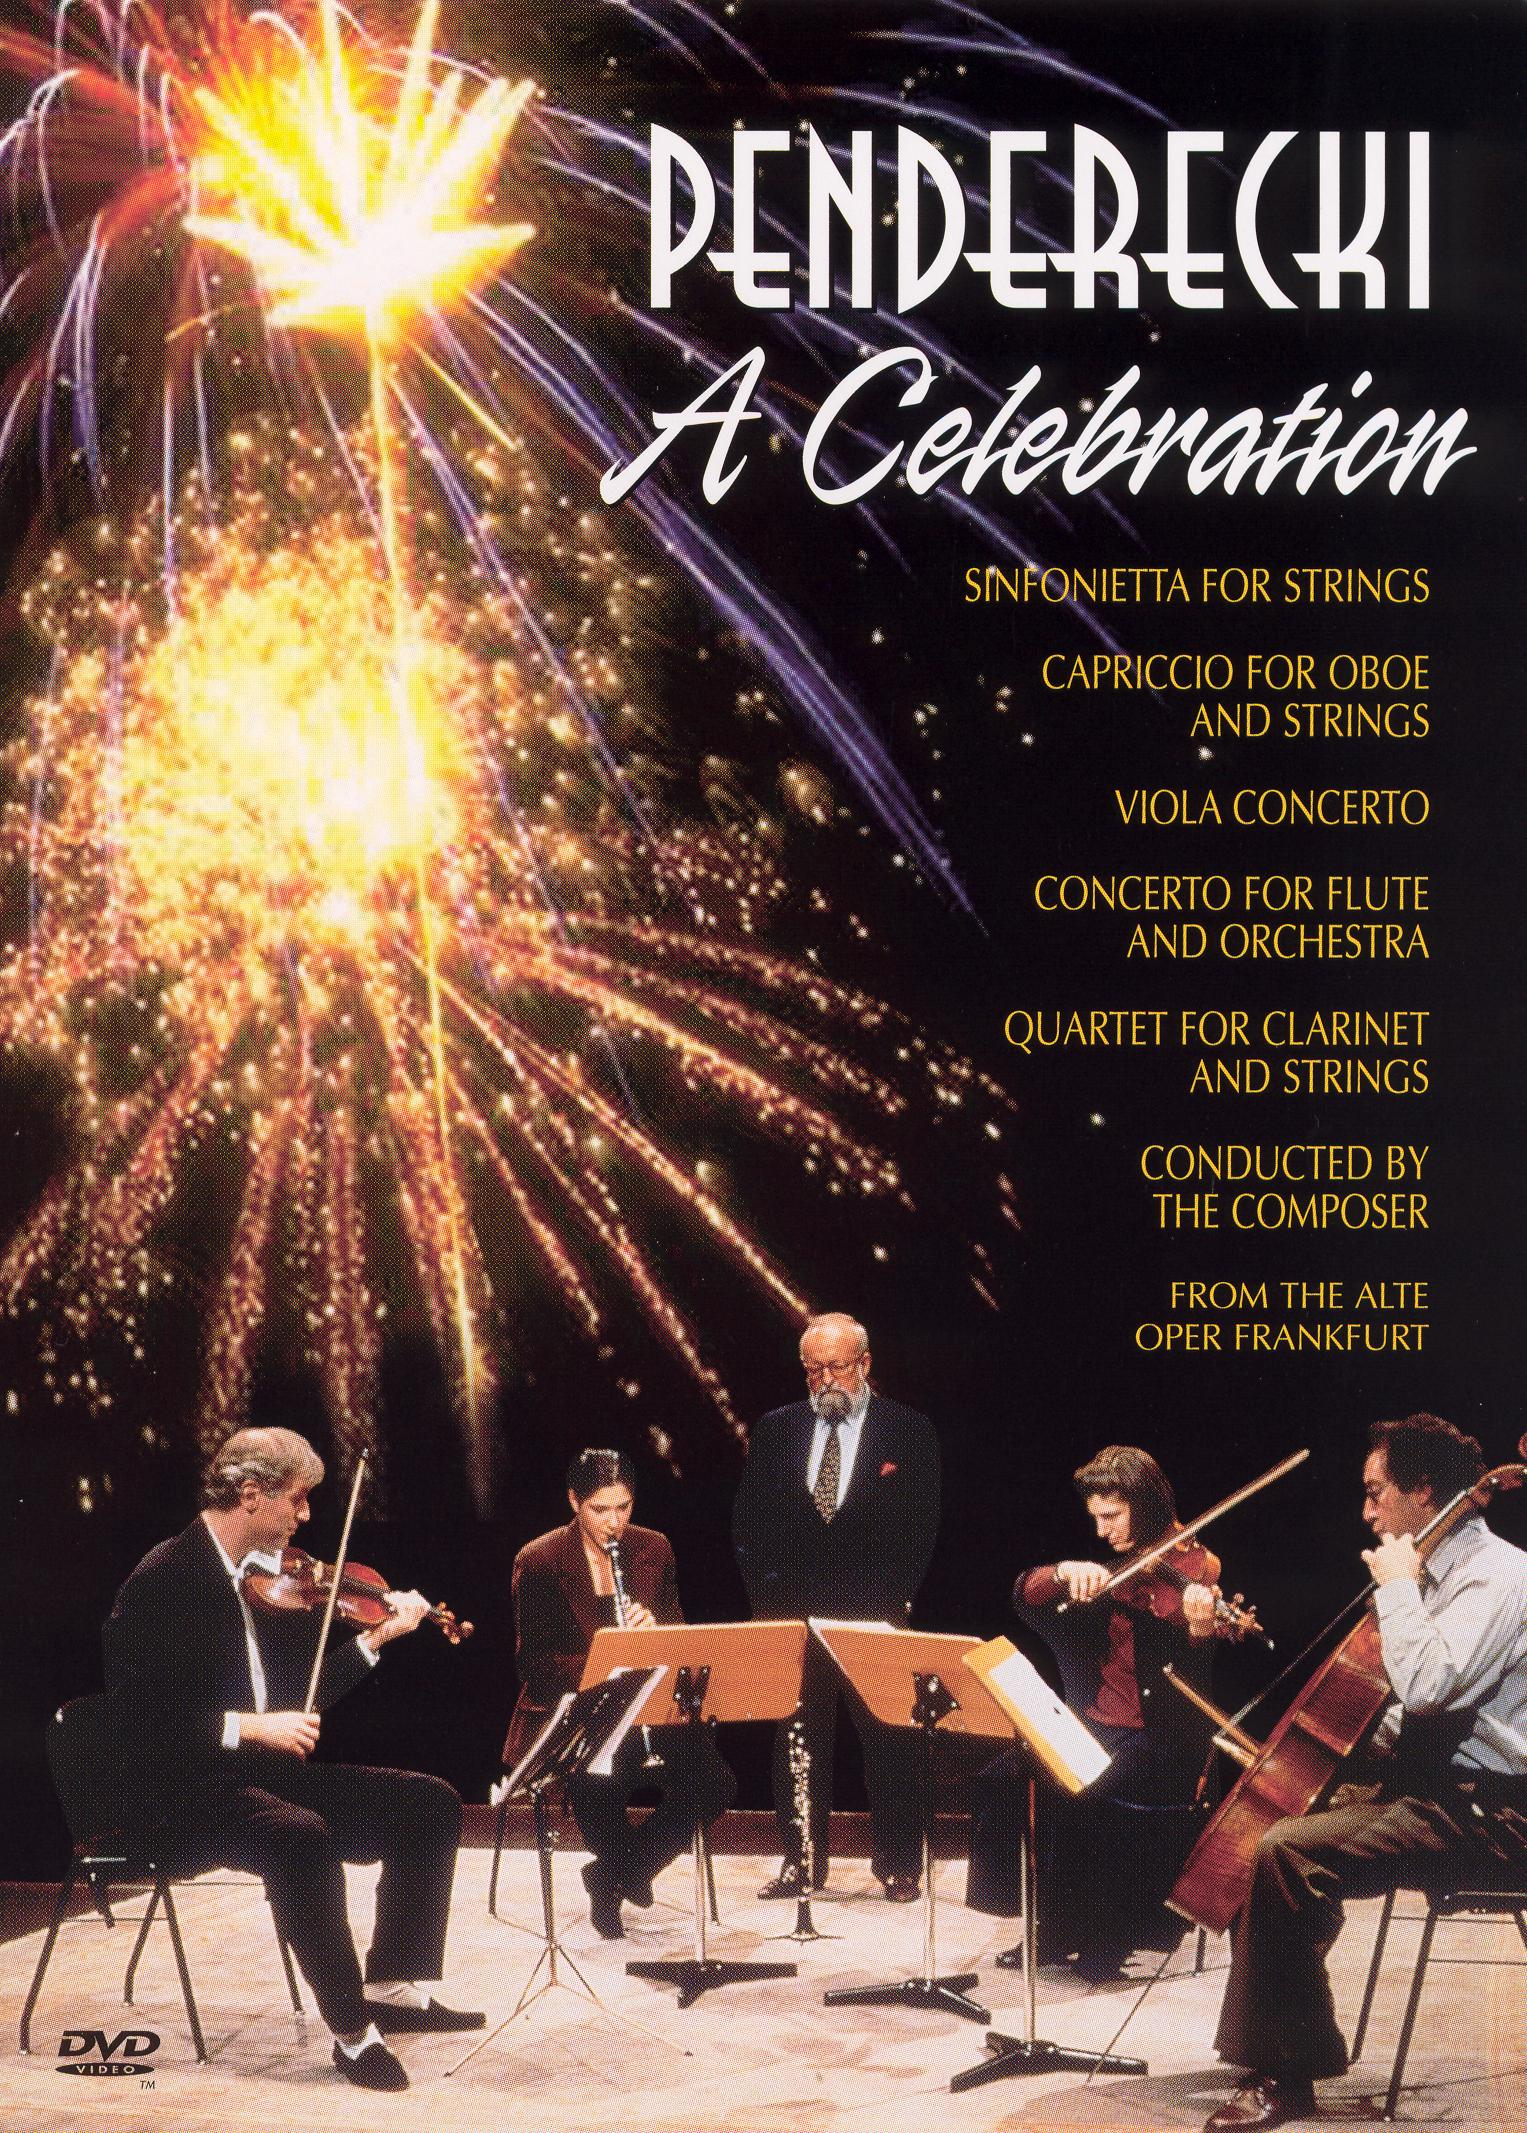 Penderecki: A Celebration